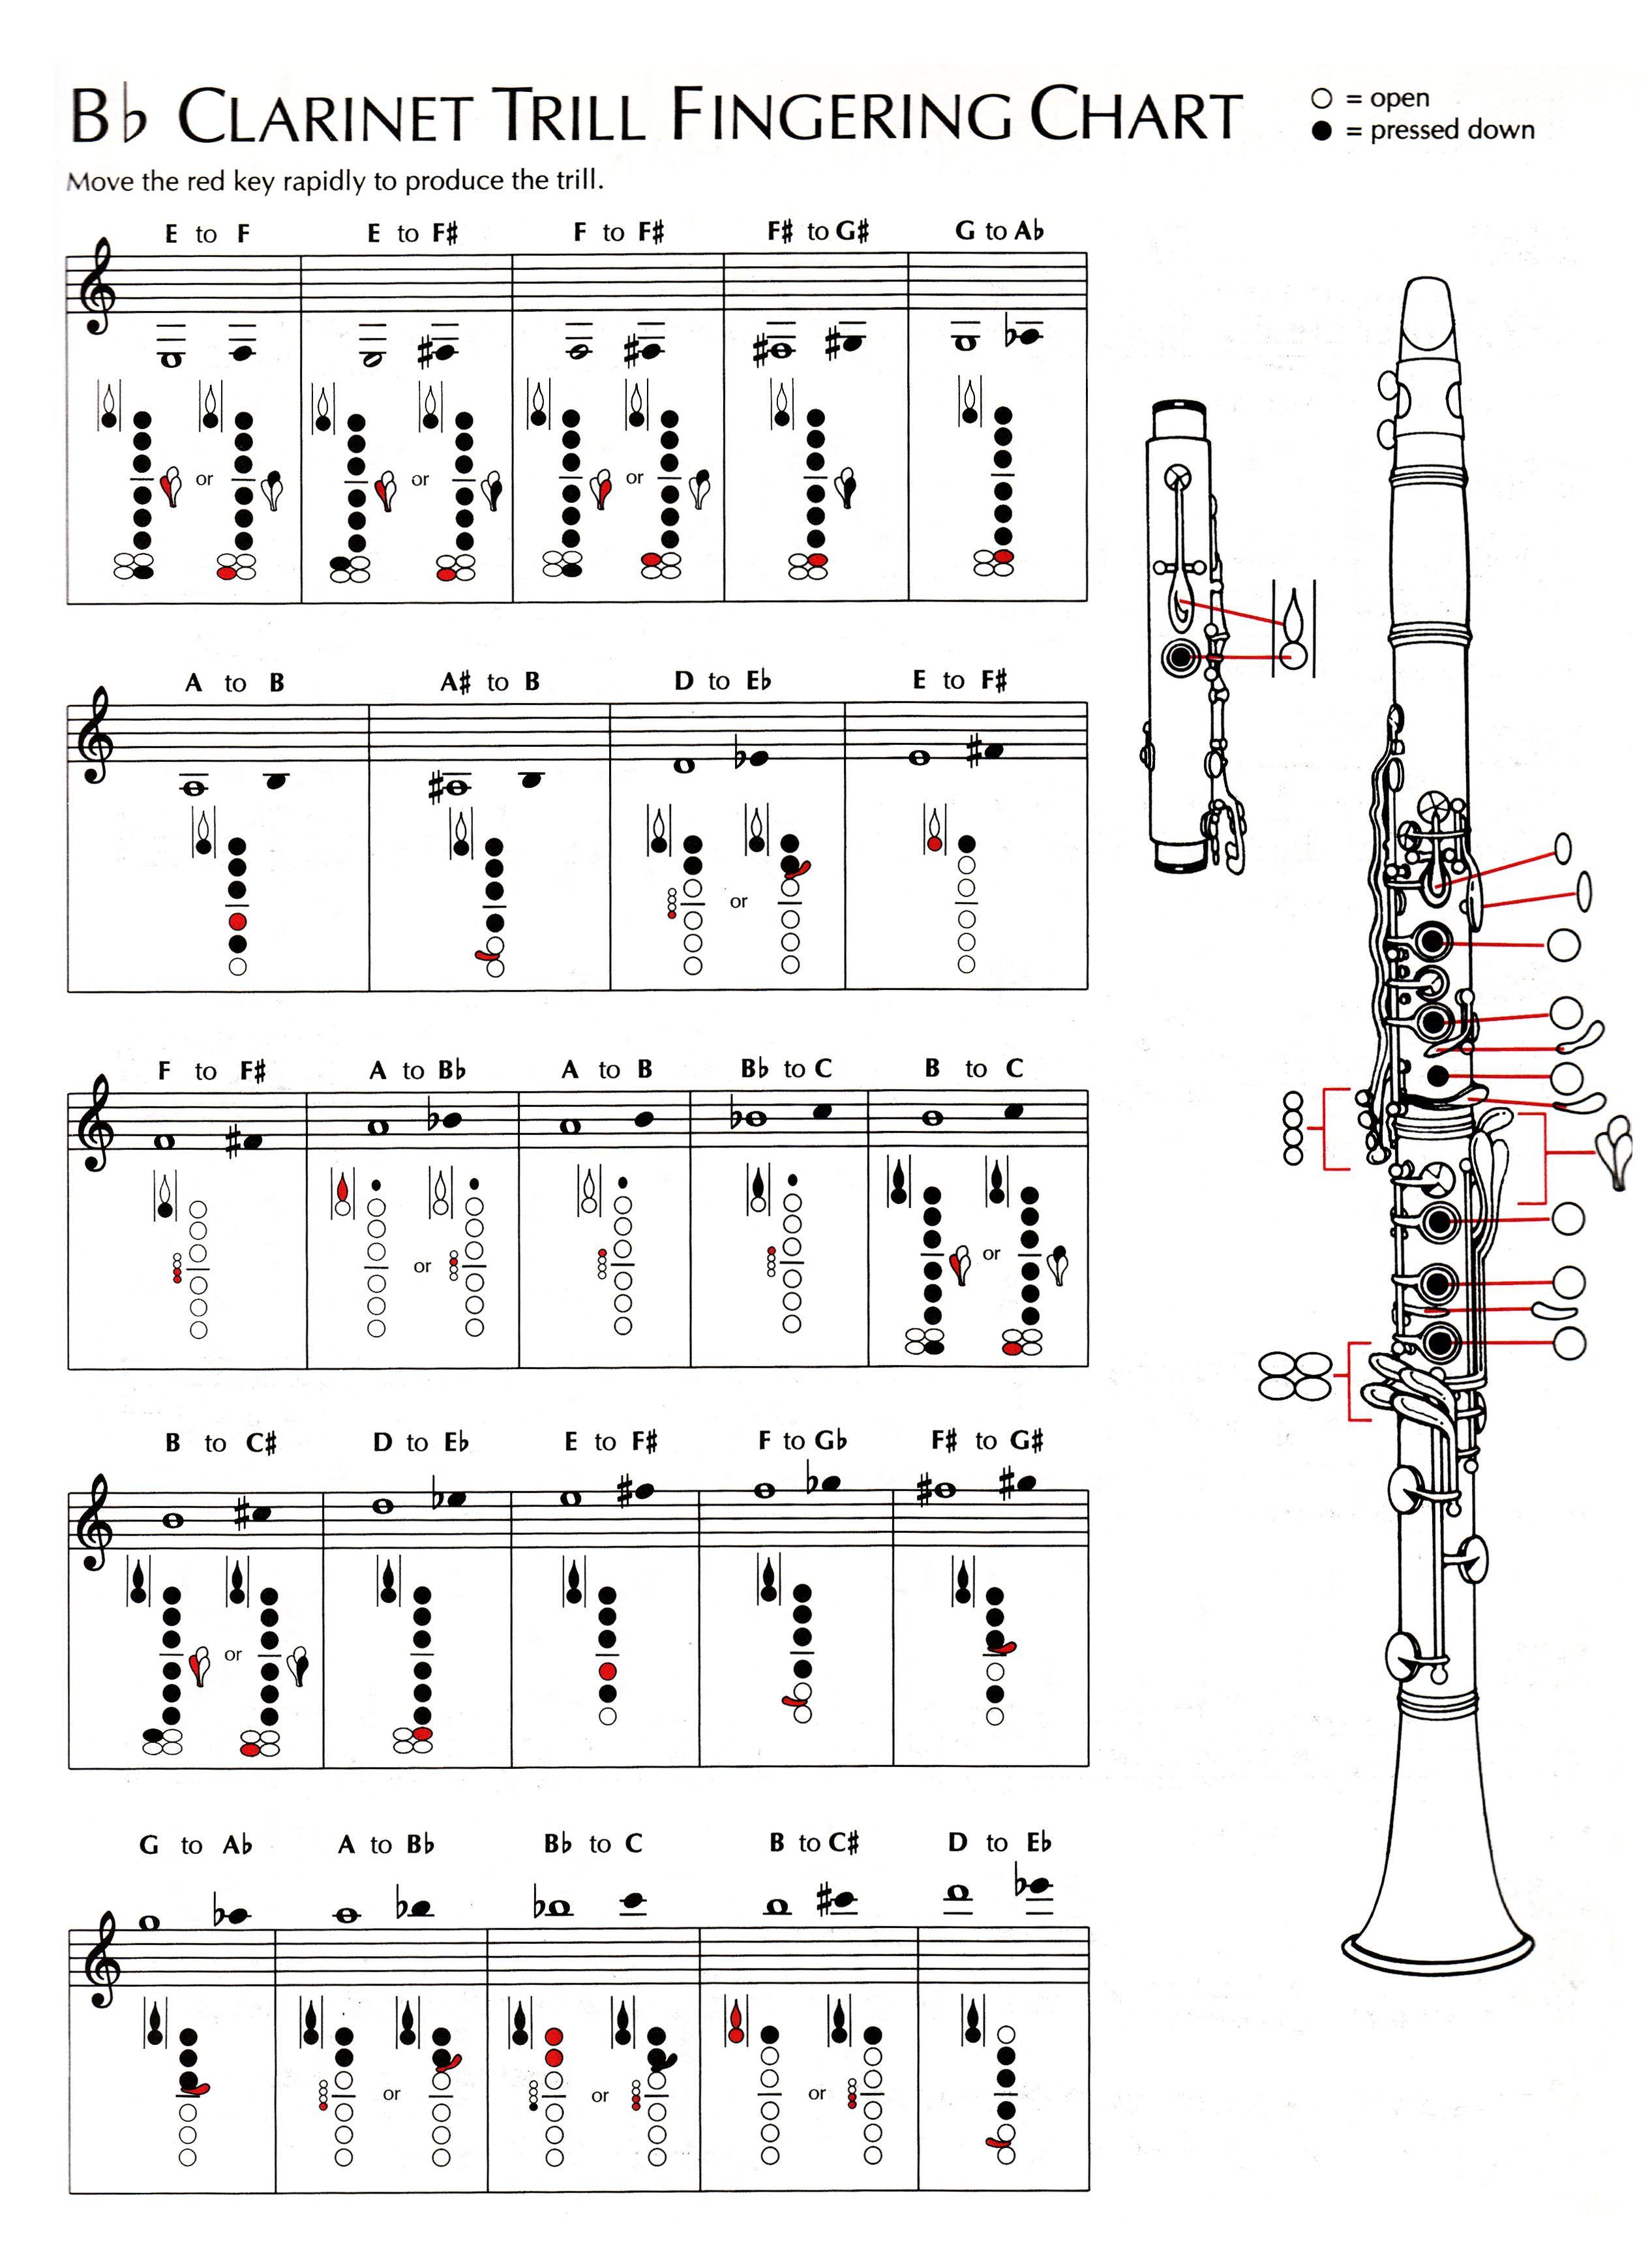 Pin by karla sanchez on music sheet music